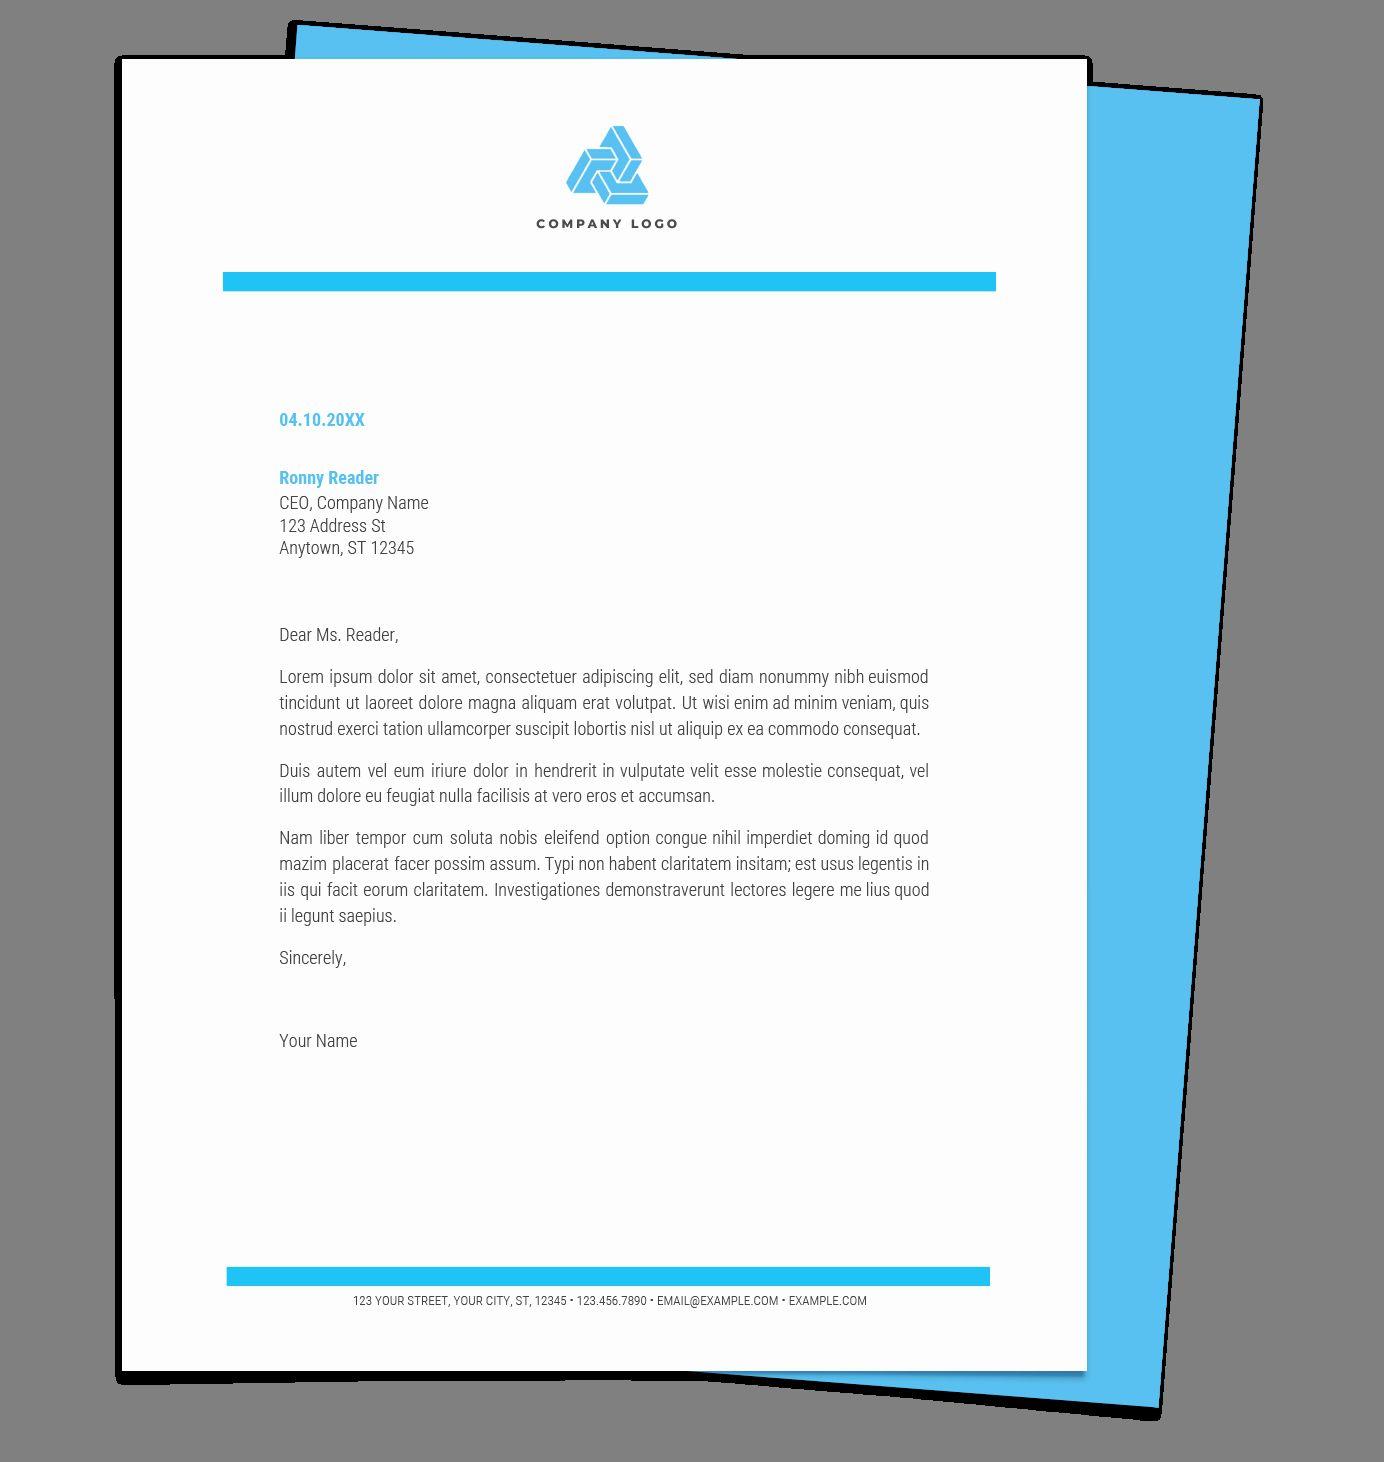 Microsoft Word Letterhead Template Elegant Free Letterhead Templates For Google Docs And W Free Letterhead Templates Letterhead Template Business Card Template - ms word letter template